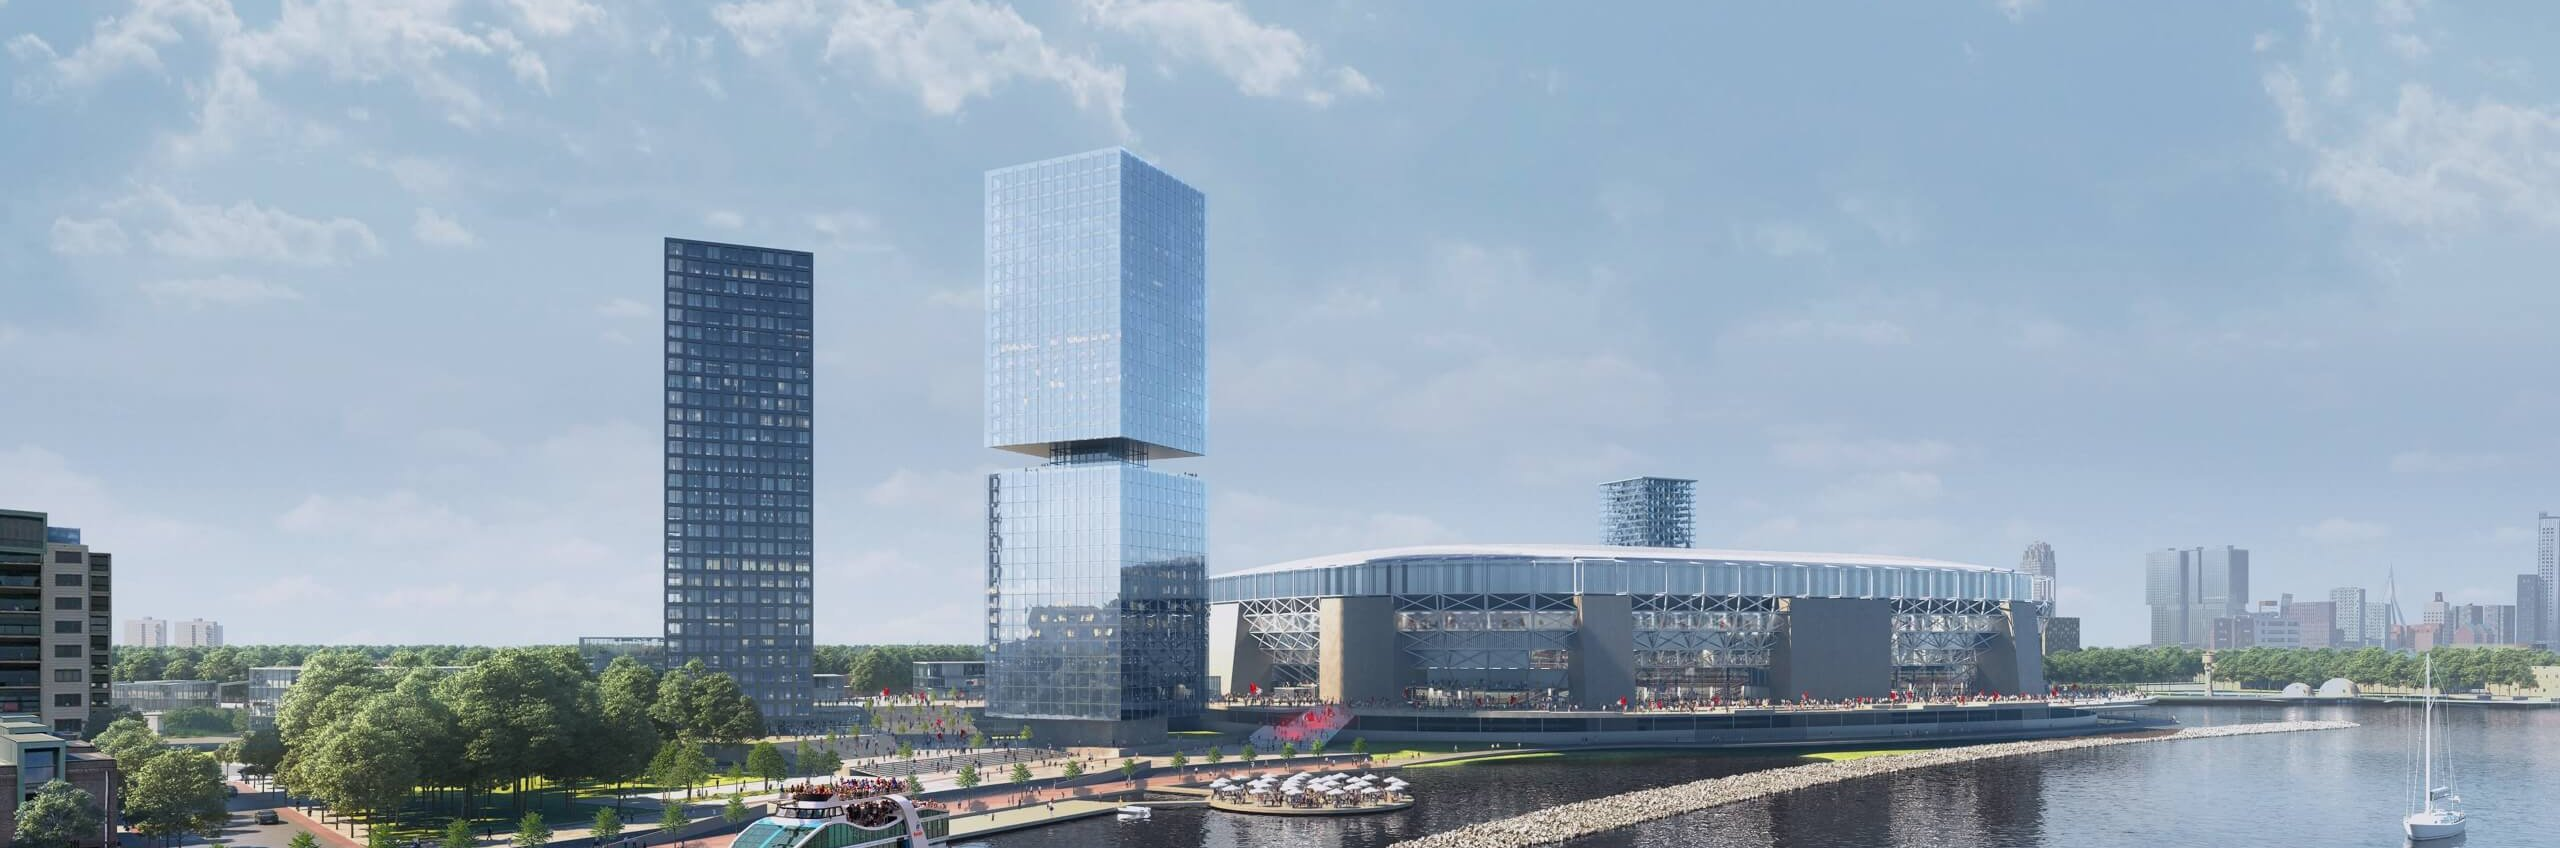 Belangrijke stap binnen Feyenoord City: akkoord over uitplaatsing TLR